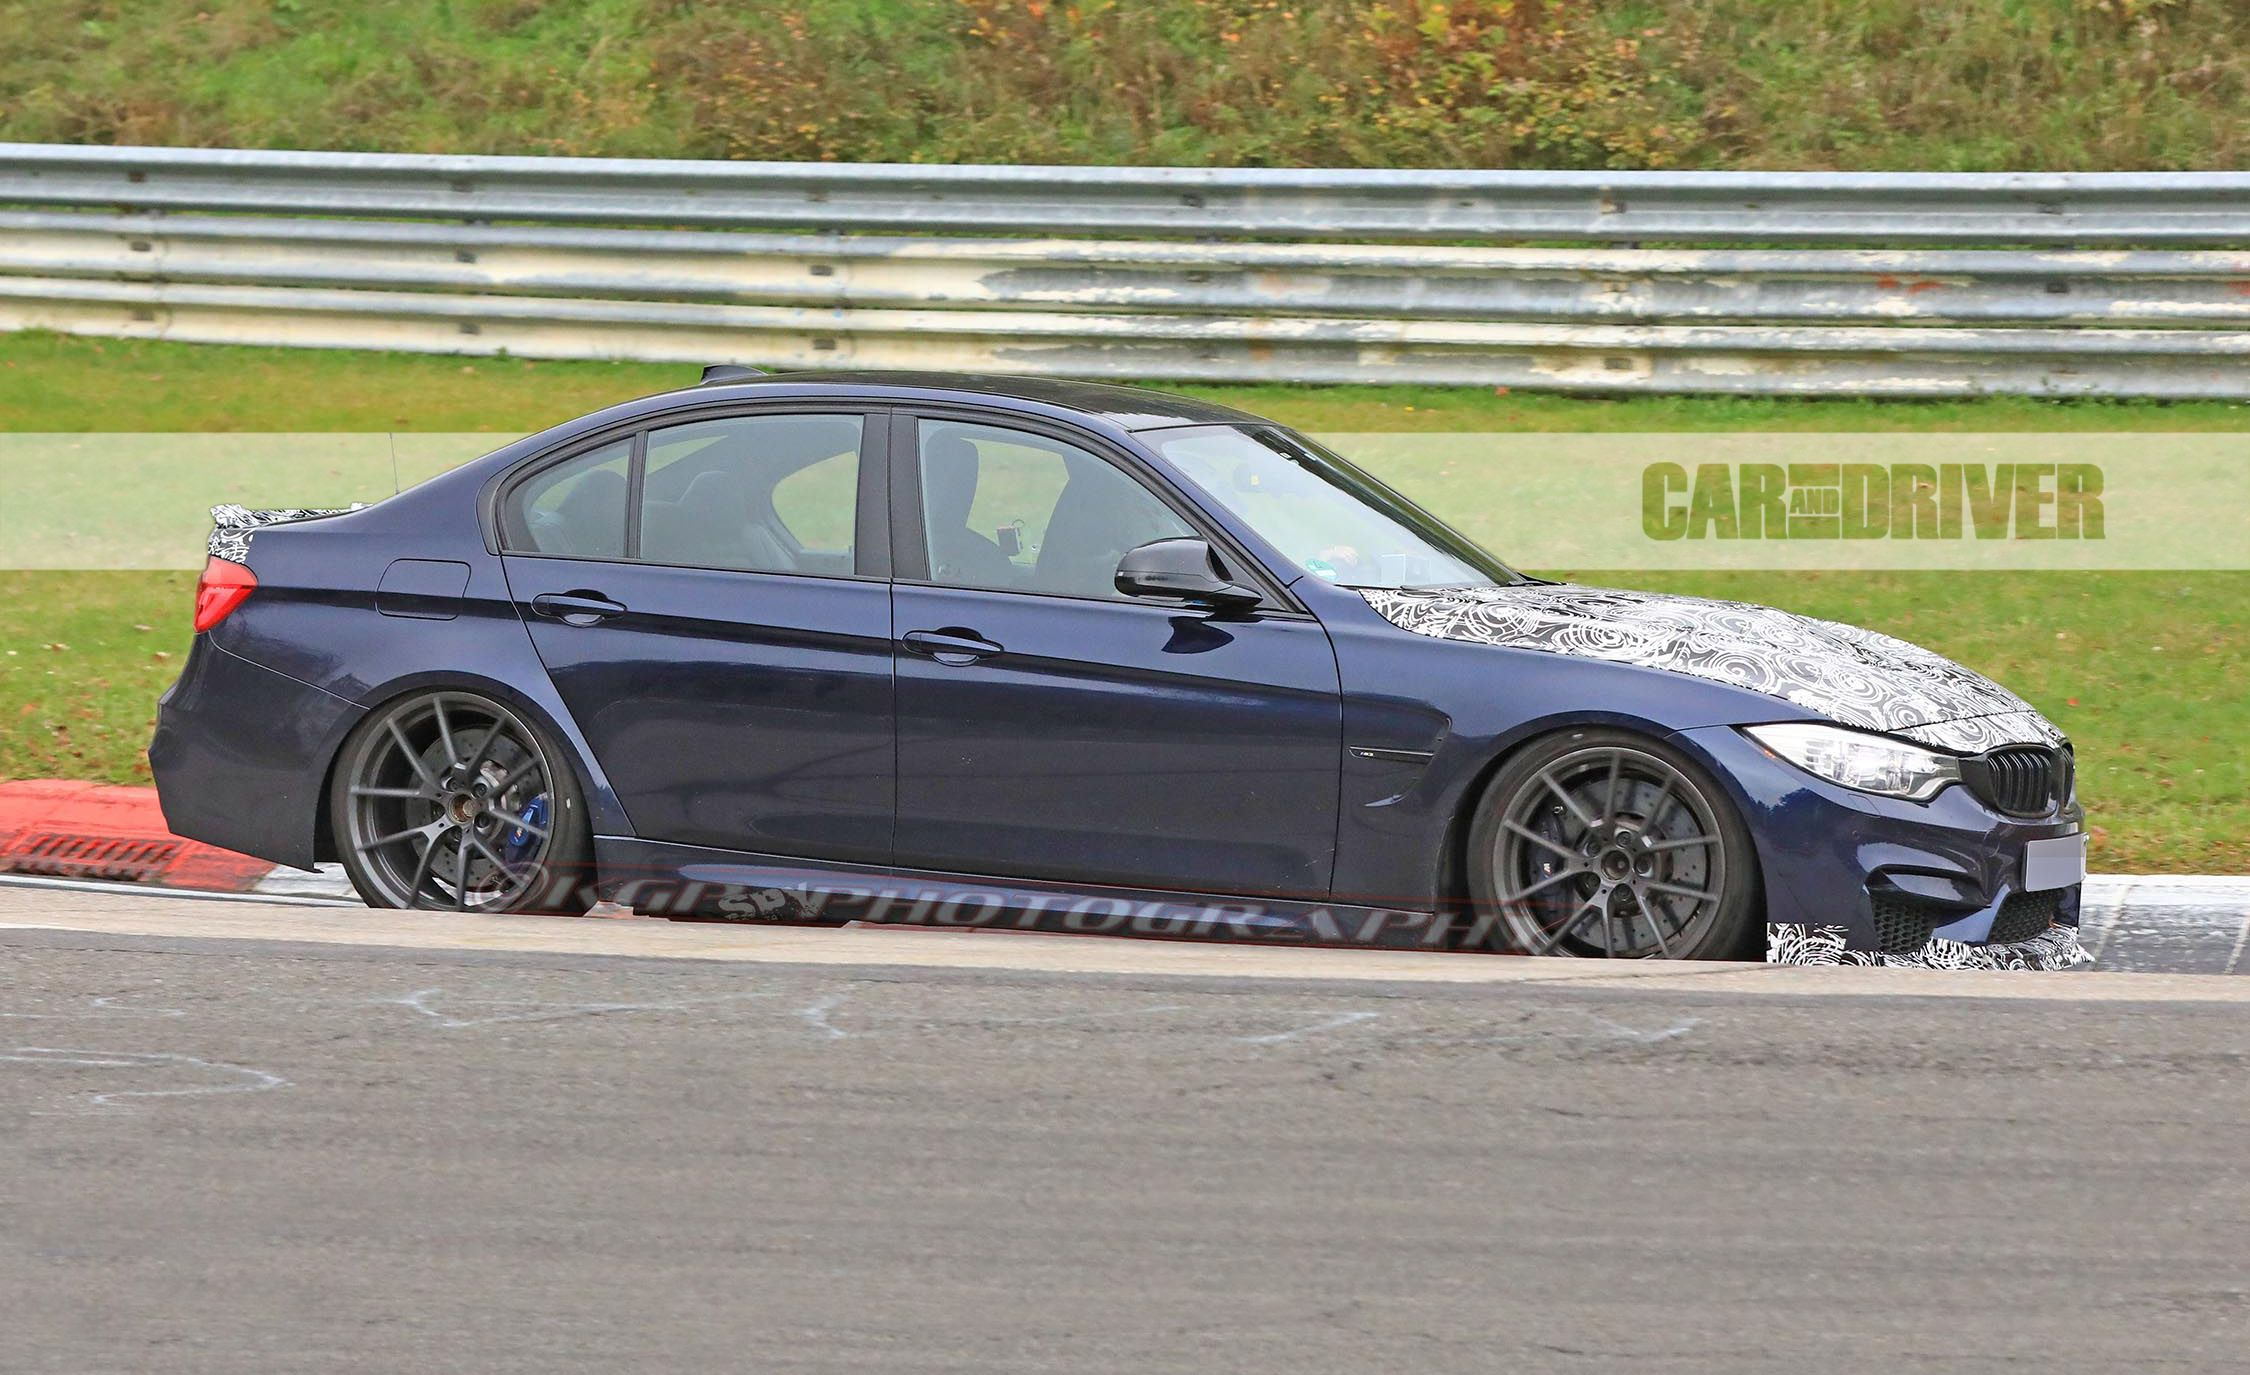 2018 BMW M3 CS Spied Testing on the Nurburgring